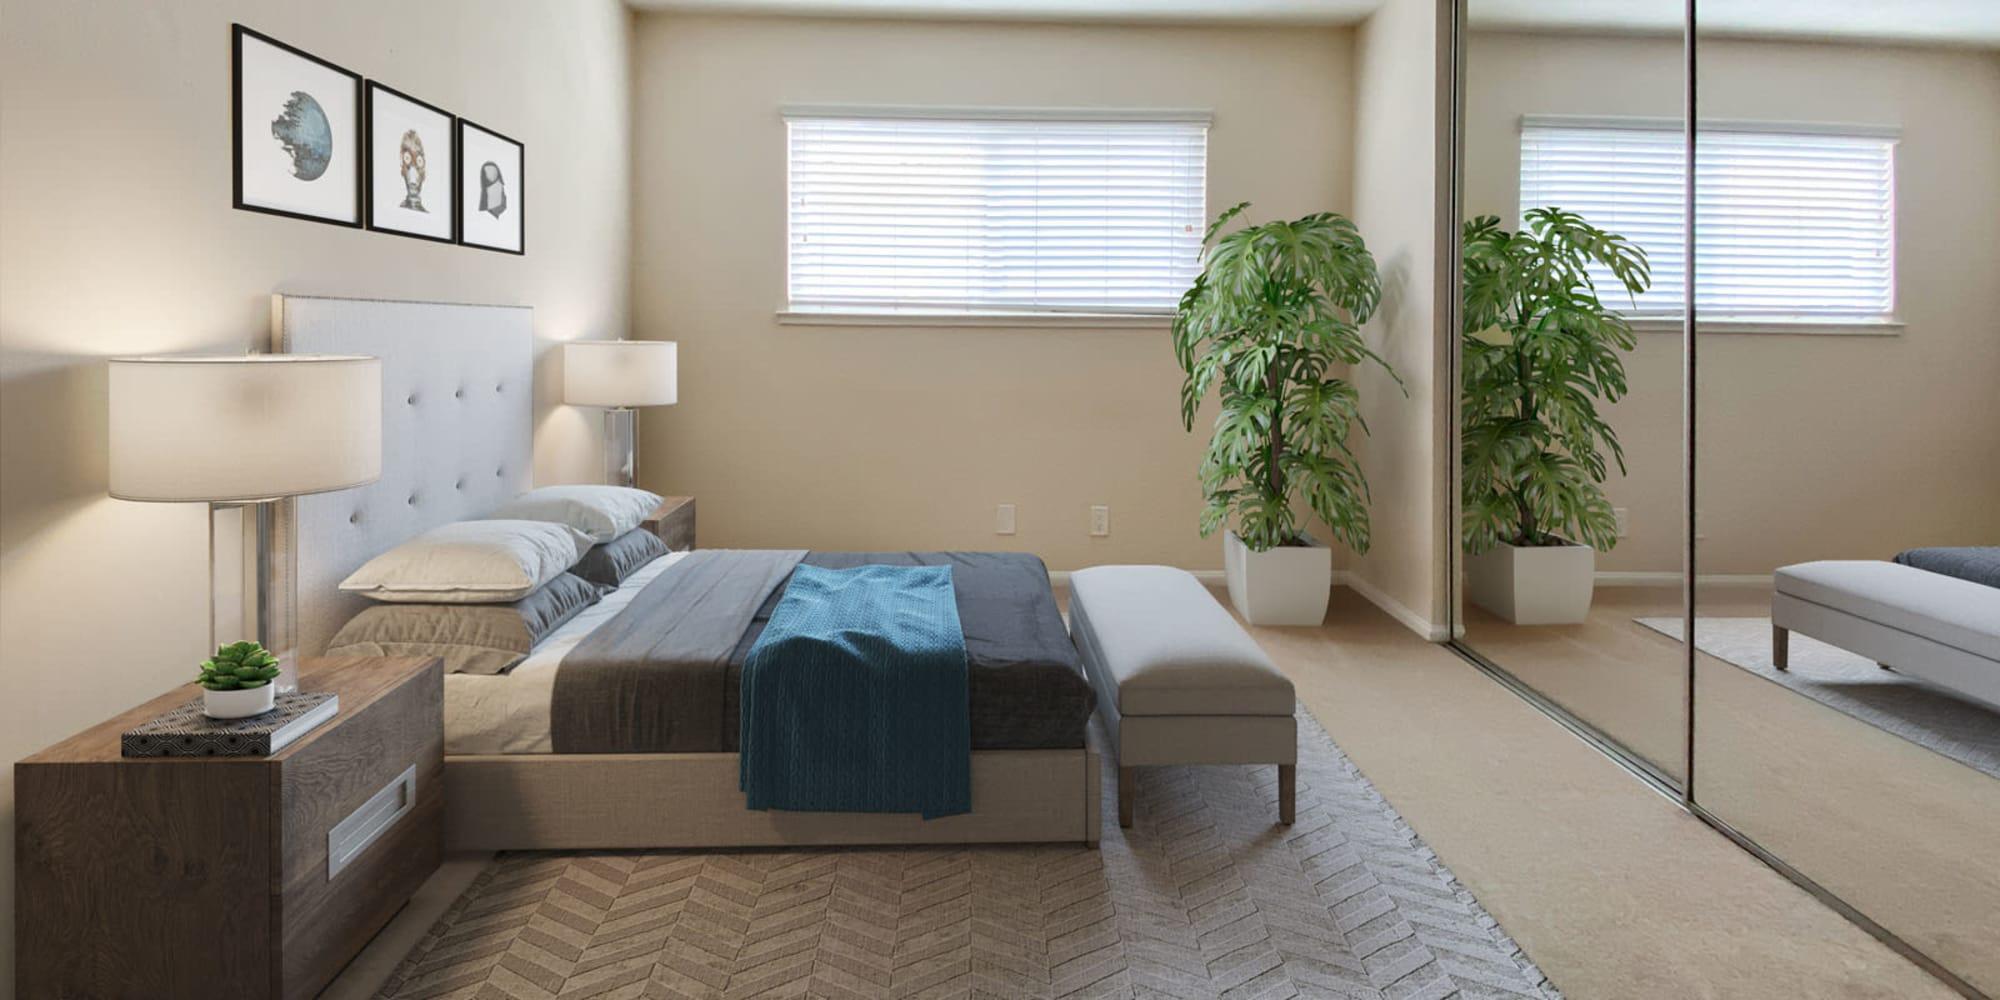 Plush carpeting and mirrored closet doors in a model apartment's bedroom at Pleasanton Place Apartment Homes in Pleasanton, California